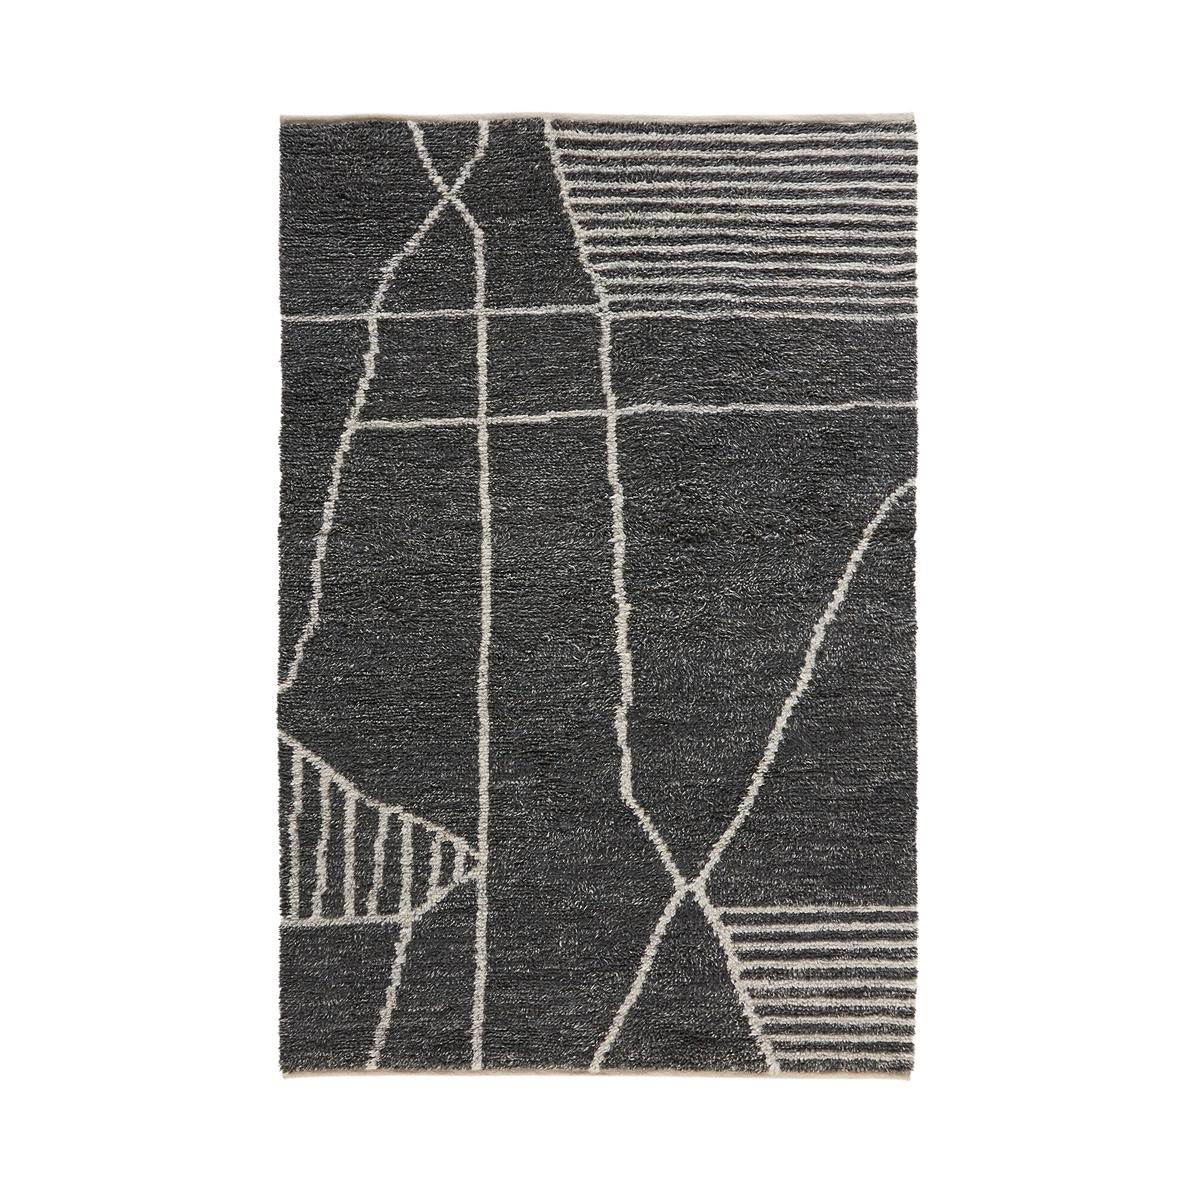 Ковер La Redoute Берберский из шерсти Elva 120 x 170 см серый ковер la redoute из шерсти 120 x 170 см розовый